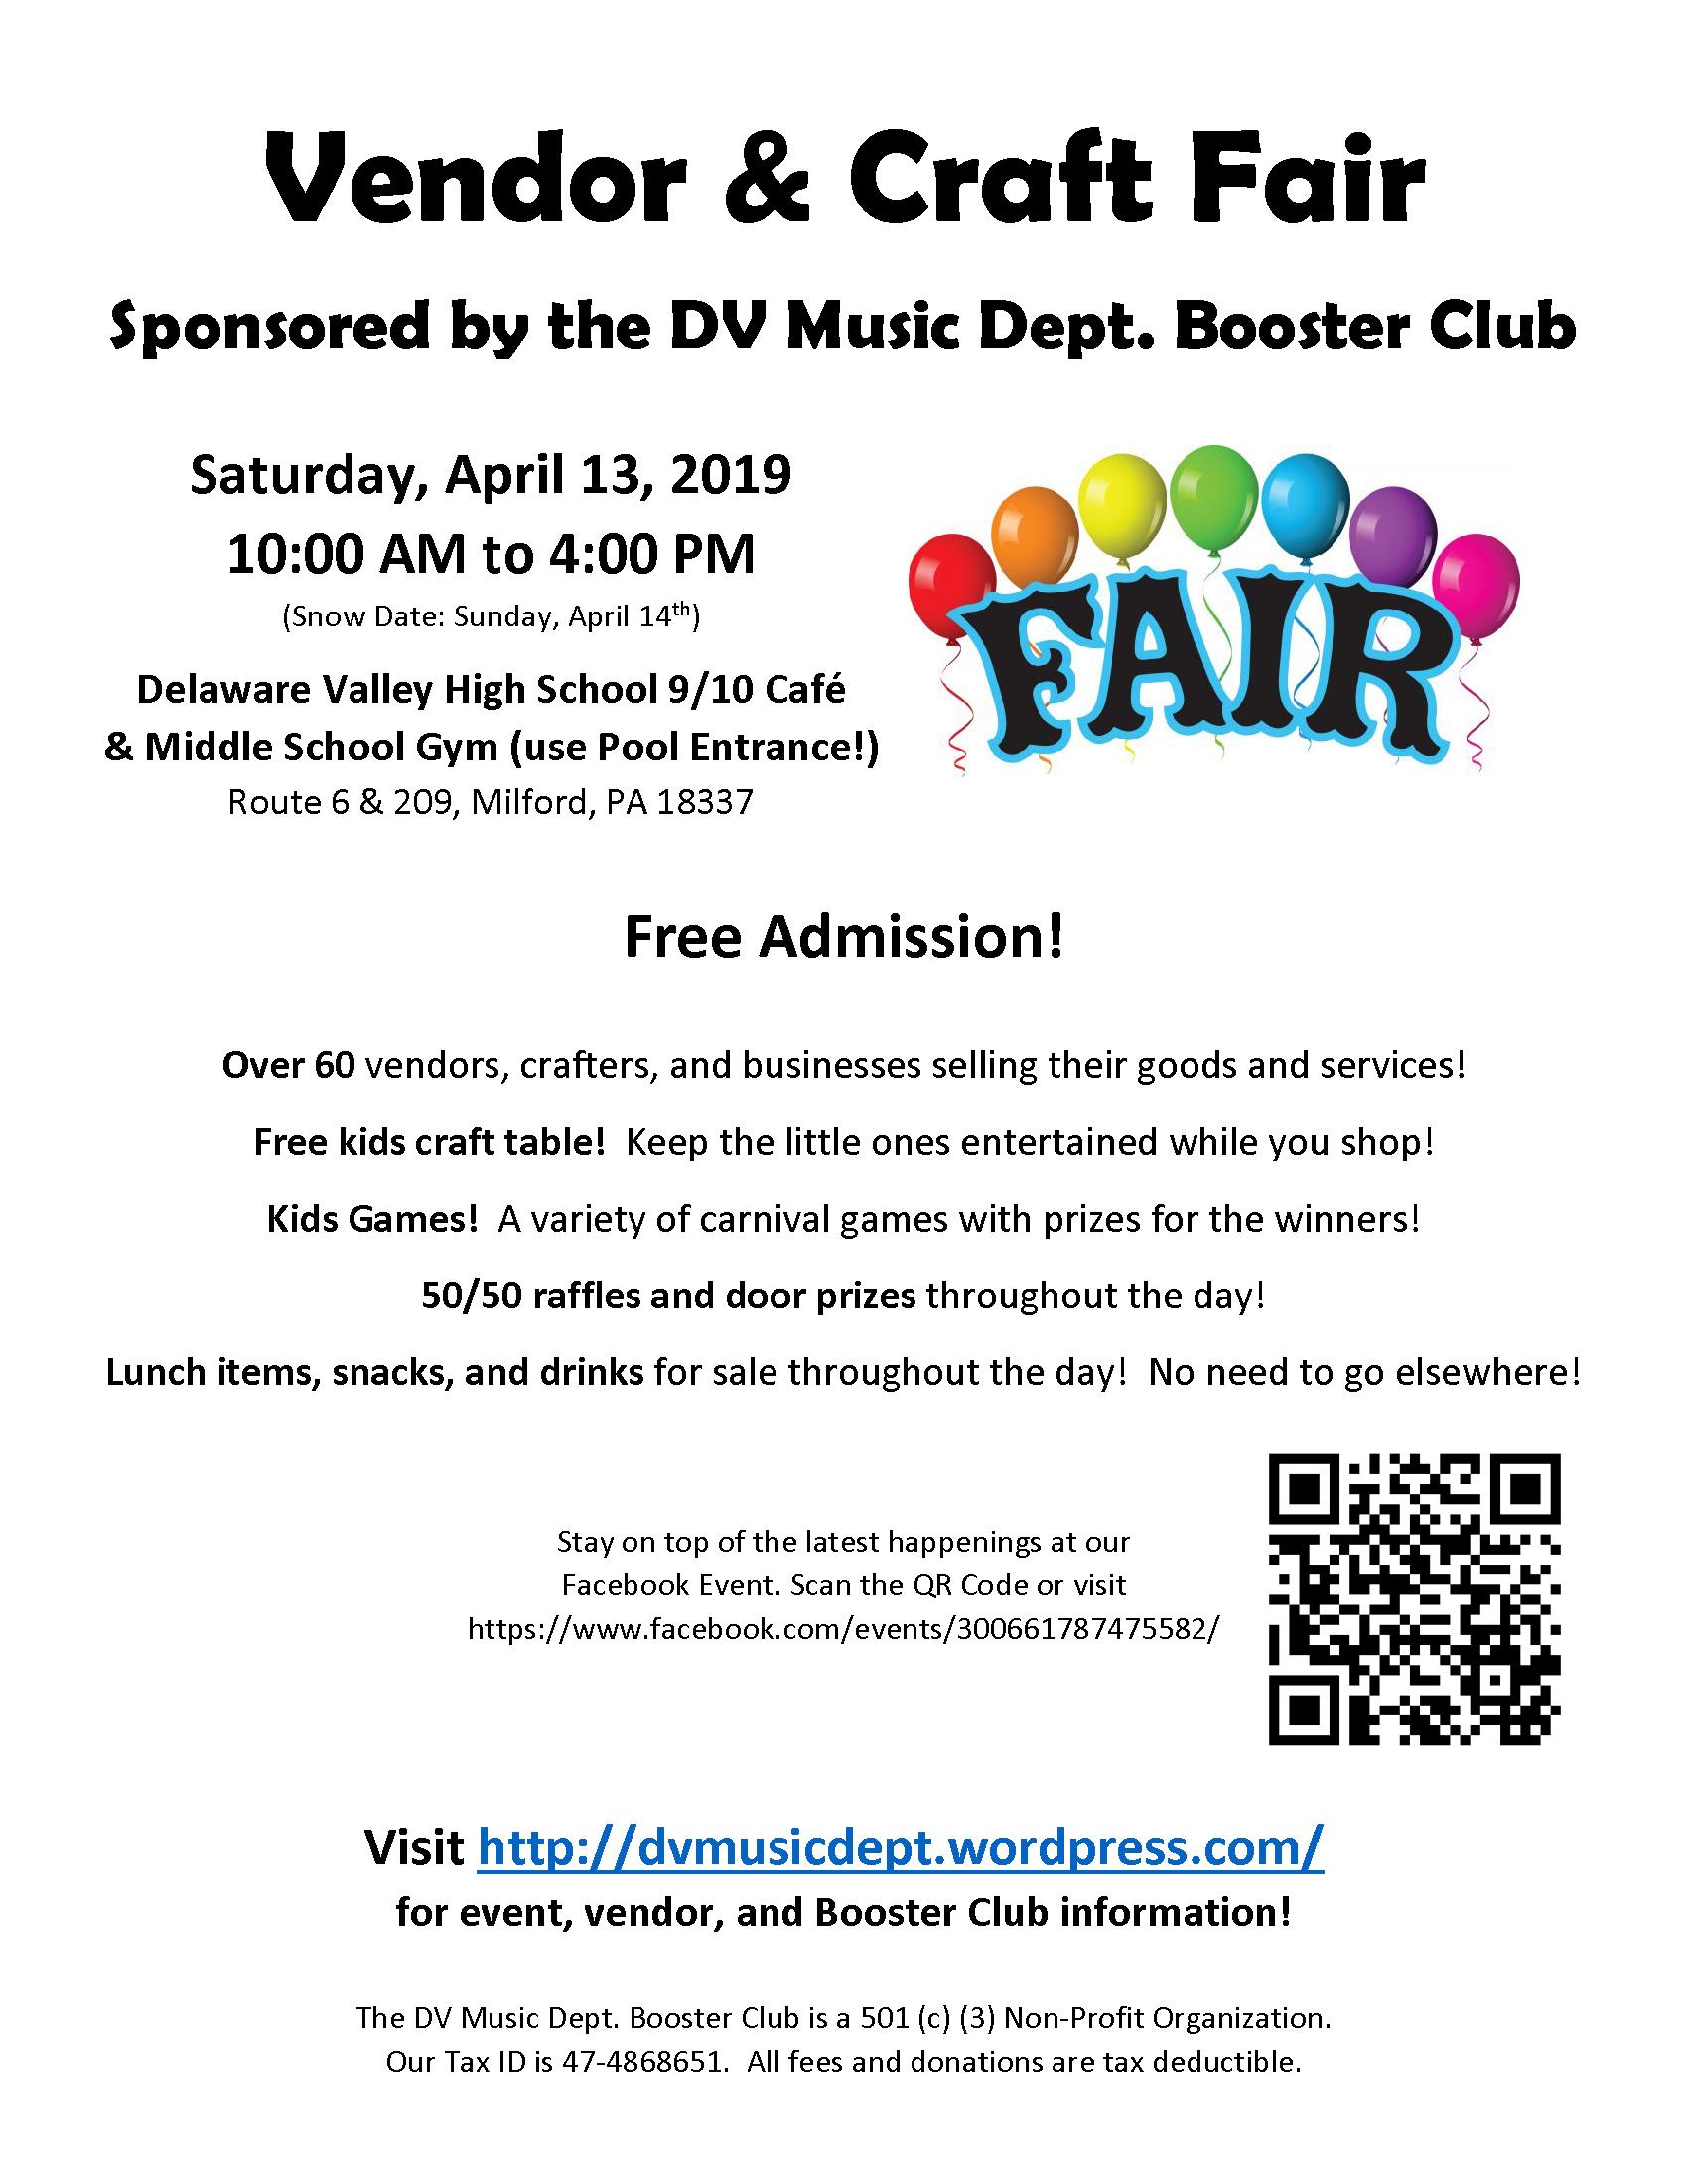 Vendor & Craft Fair | DV Music Dept Booster Club